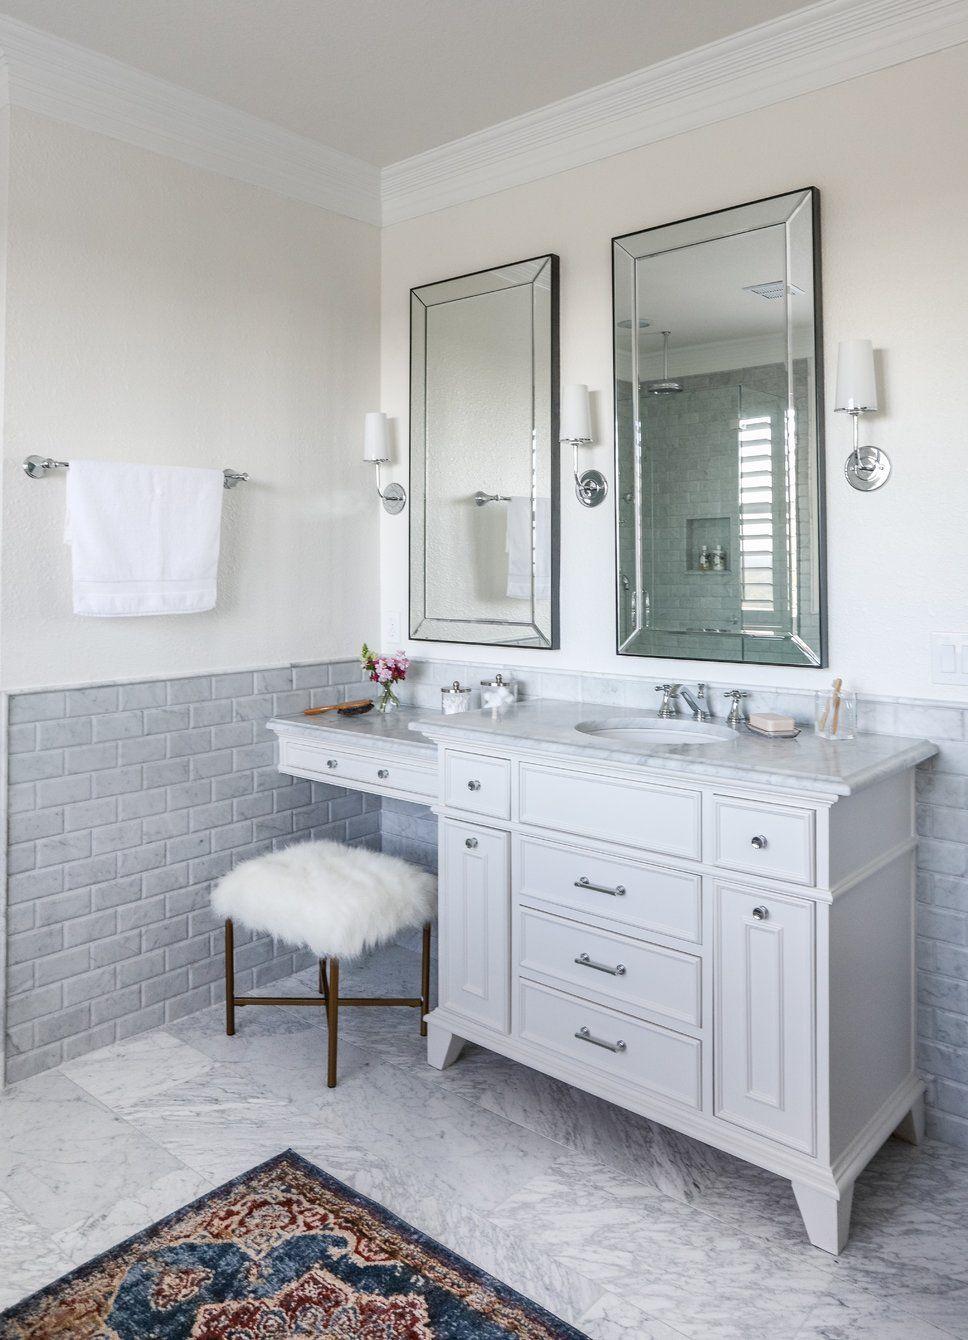 Glam Bathroom Design Photo By Sarah Stacey Interior Design